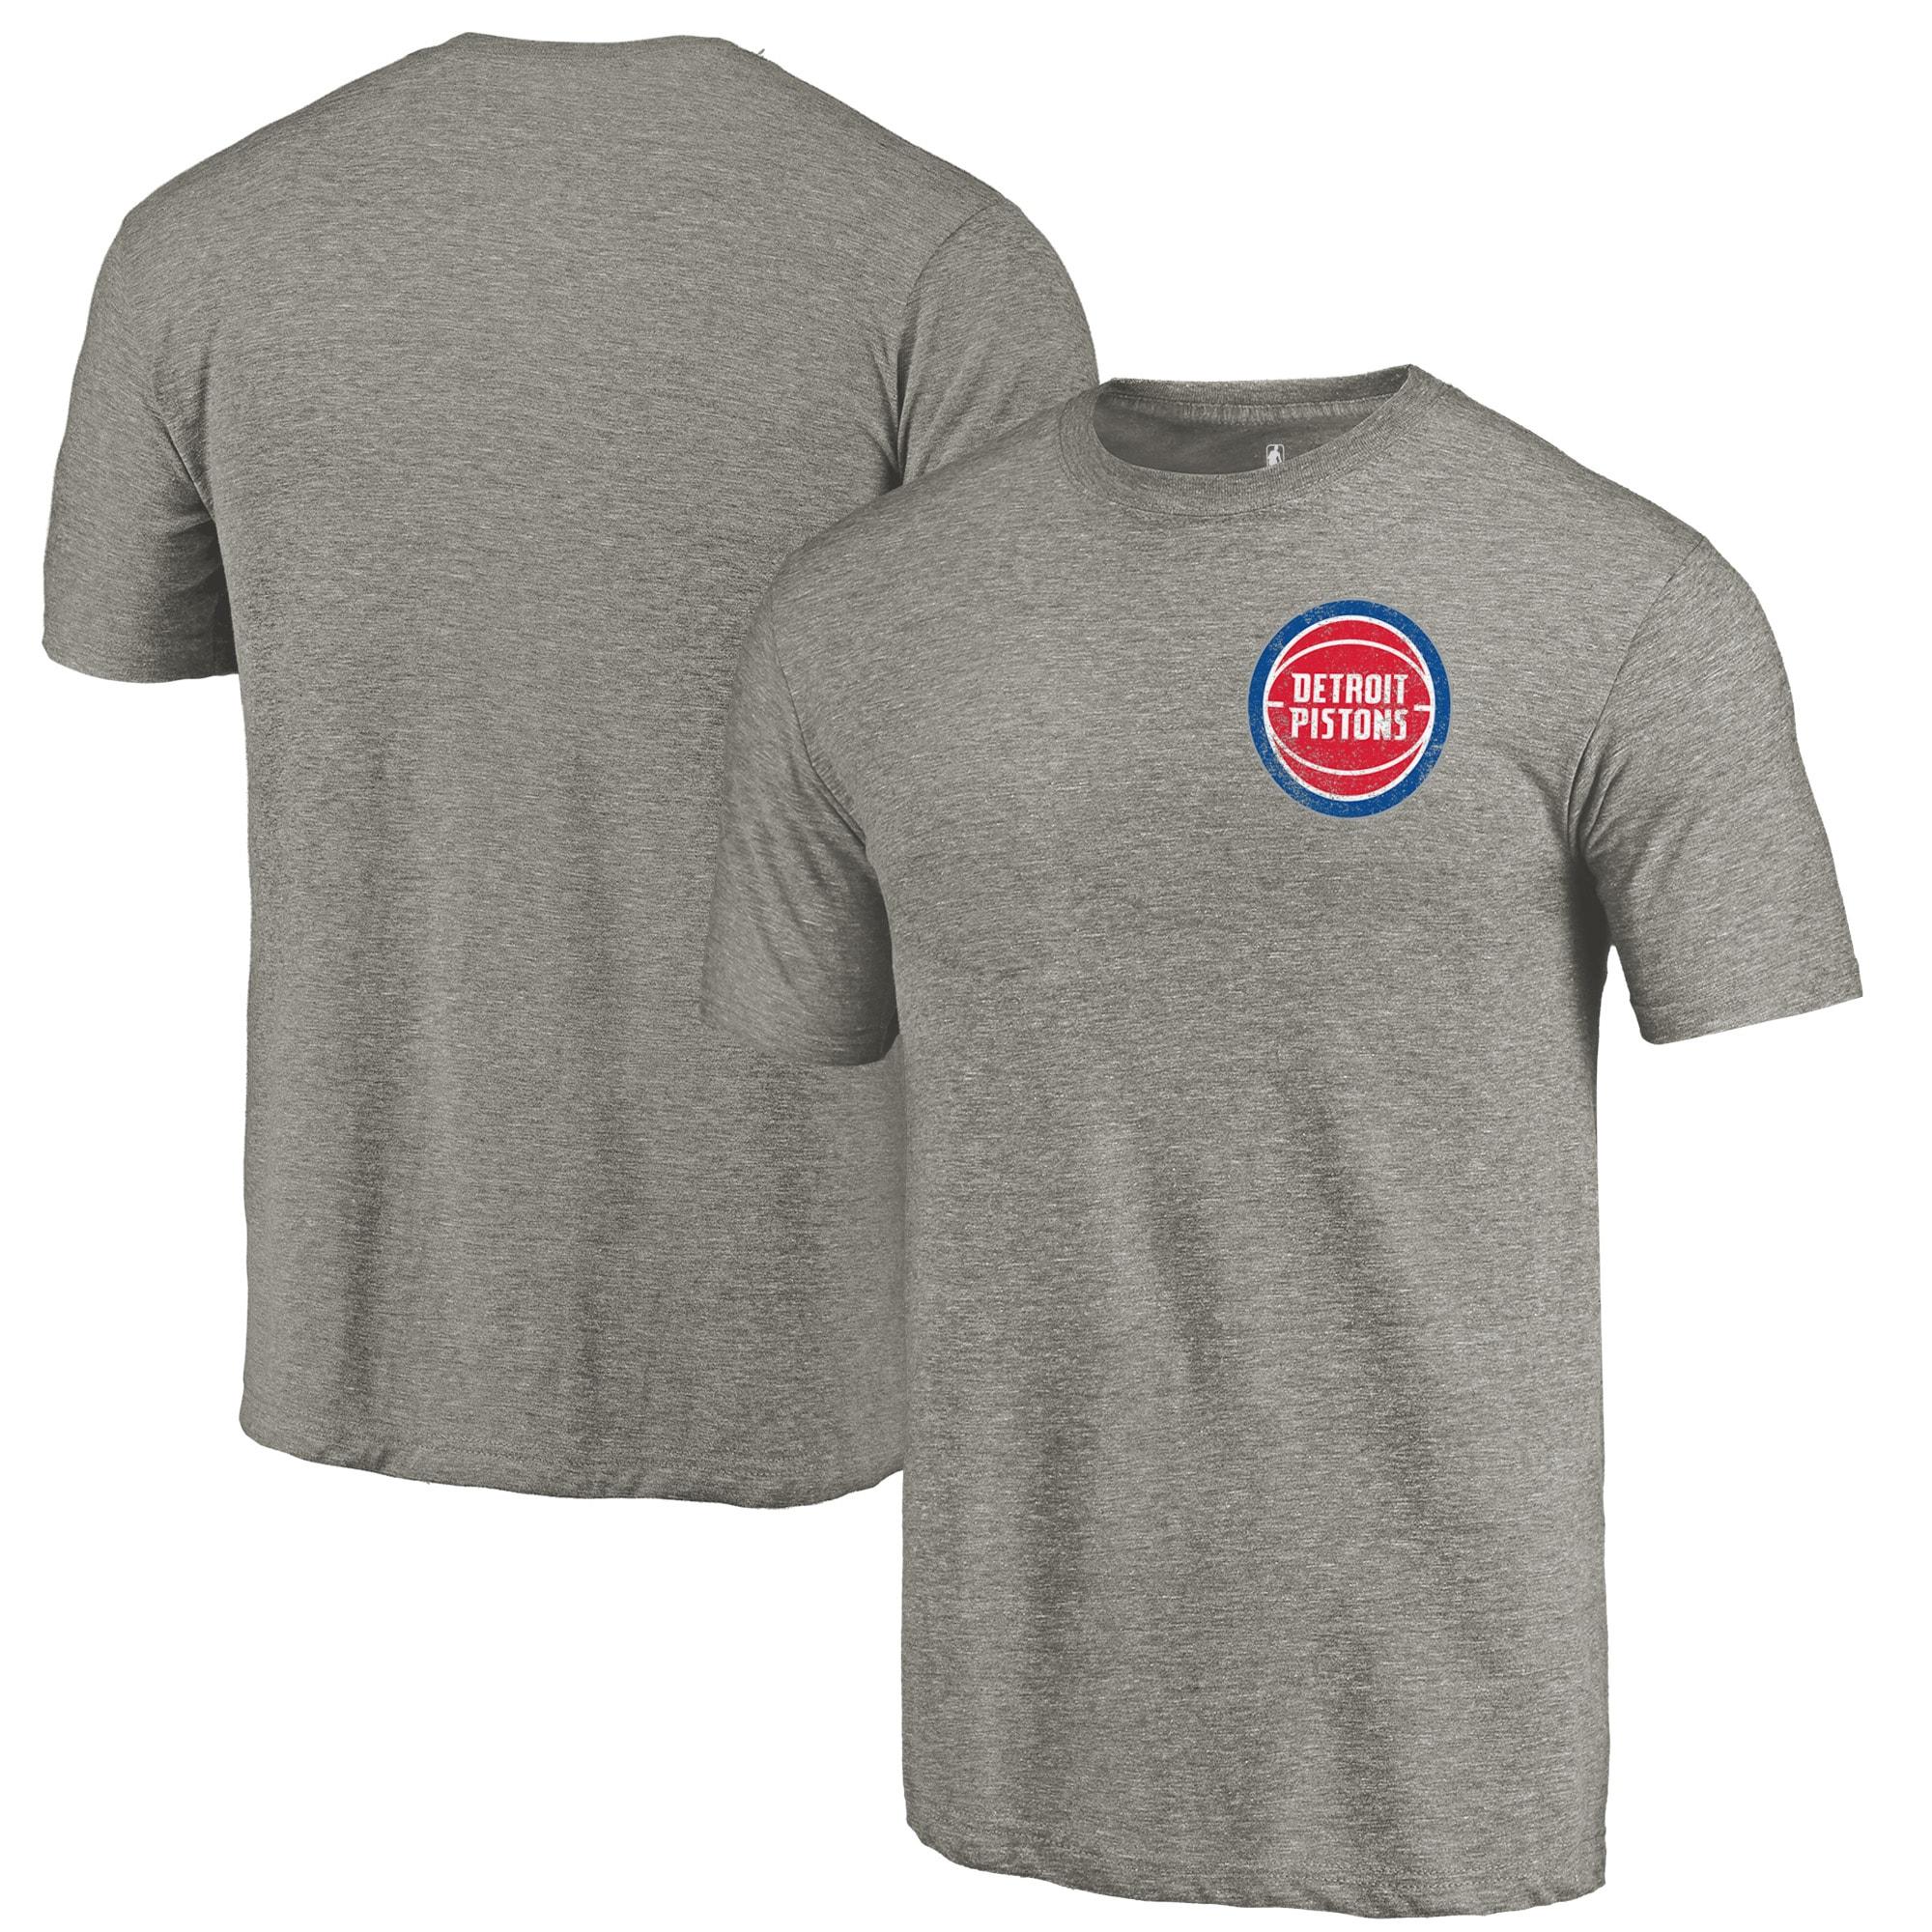 Detroit Pistons Fanatics Branded Primary Logo Left Chest Distressed Tri-Blend T-Shirt - Gray